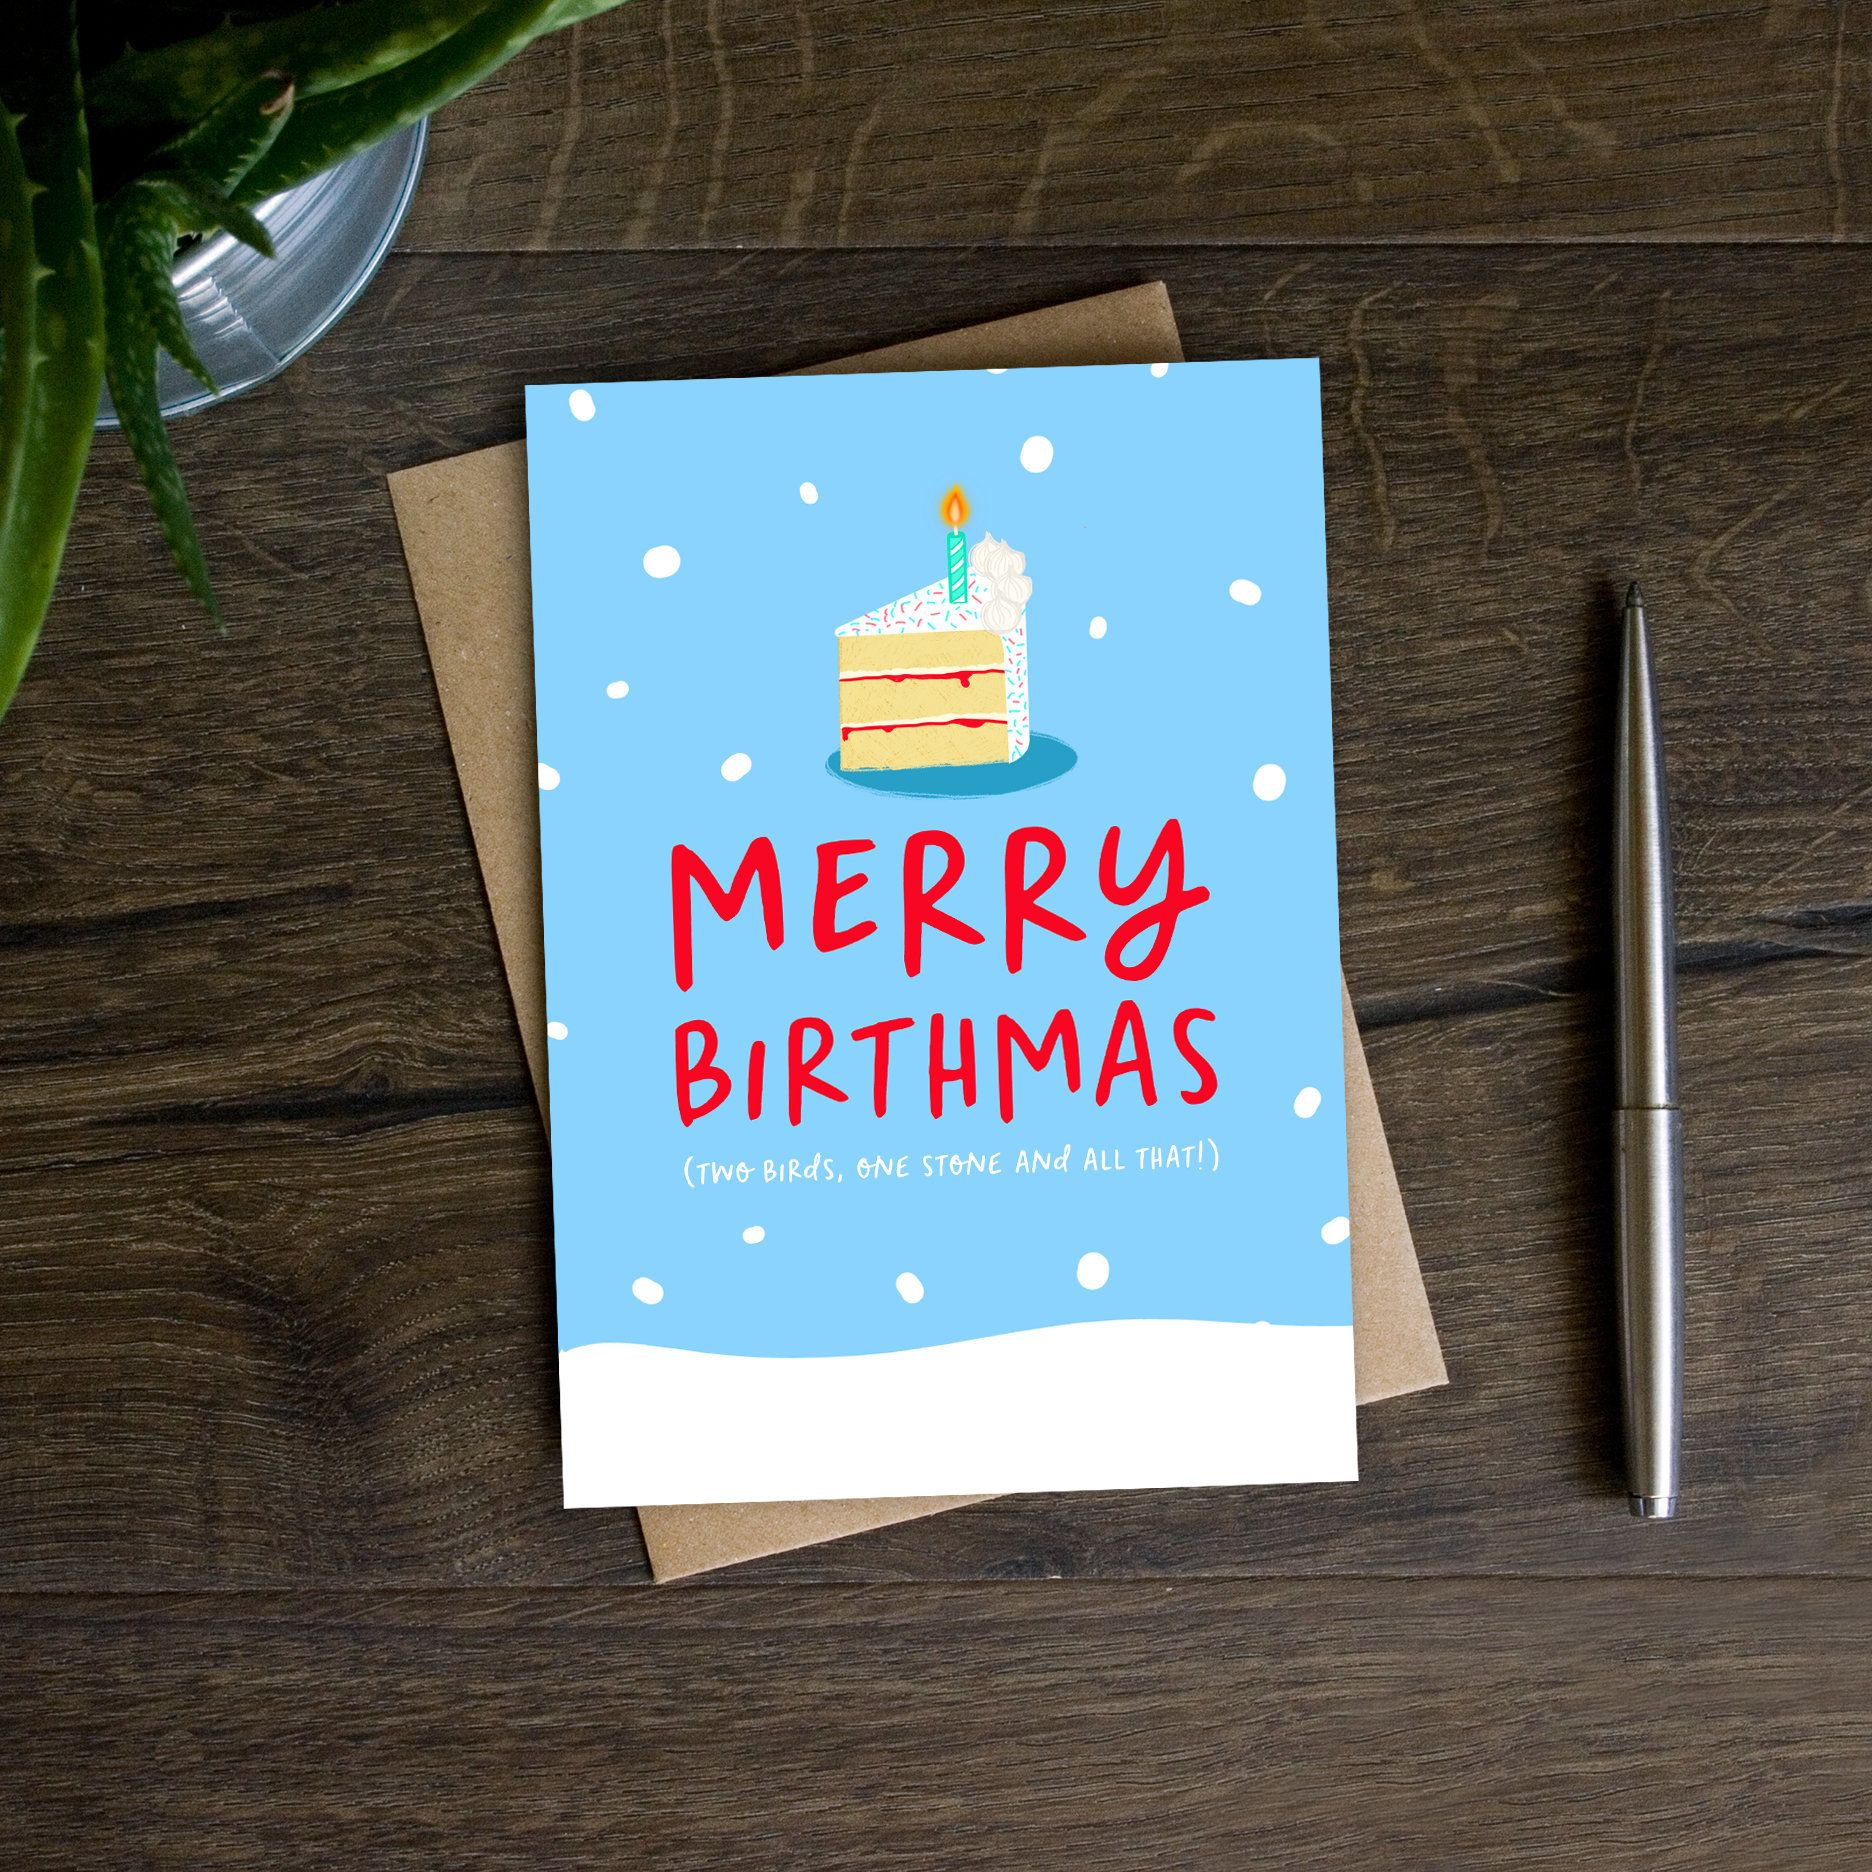 Funny December Birthday Card Merry Birthmas Christmas Etsy Christmas Birthday Cards December Birthday Birthday Cards For Brother